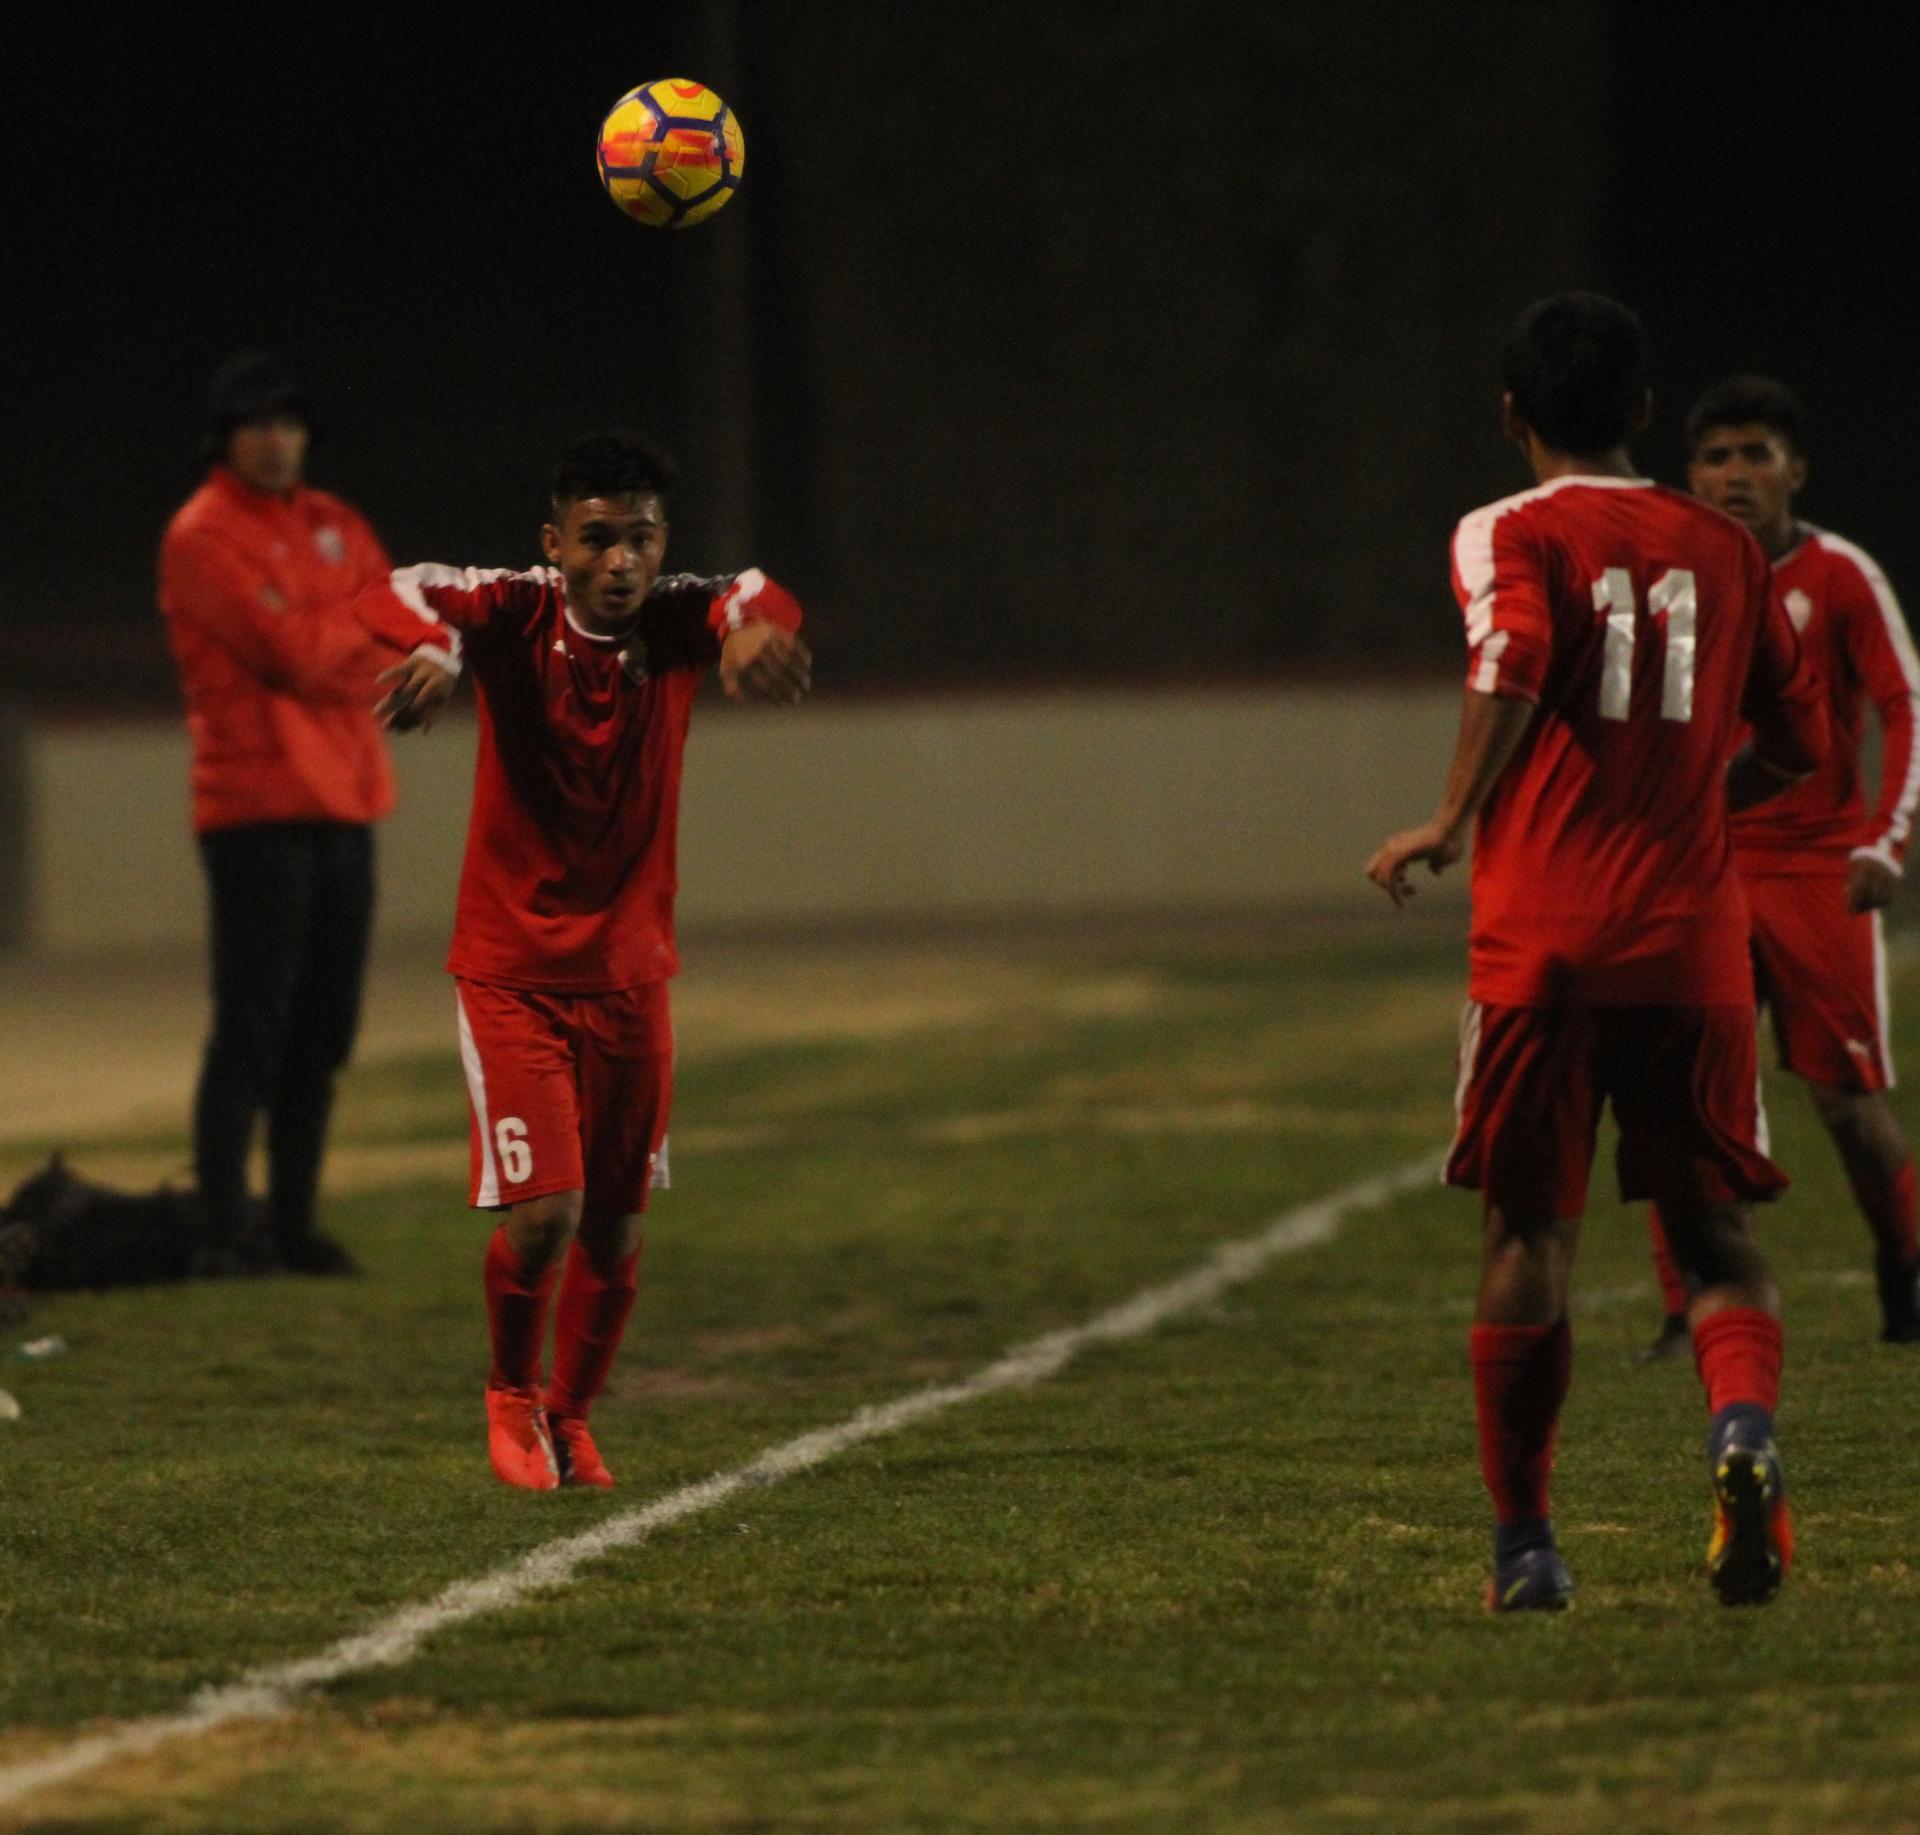 Arwin Brizo hitting the ball